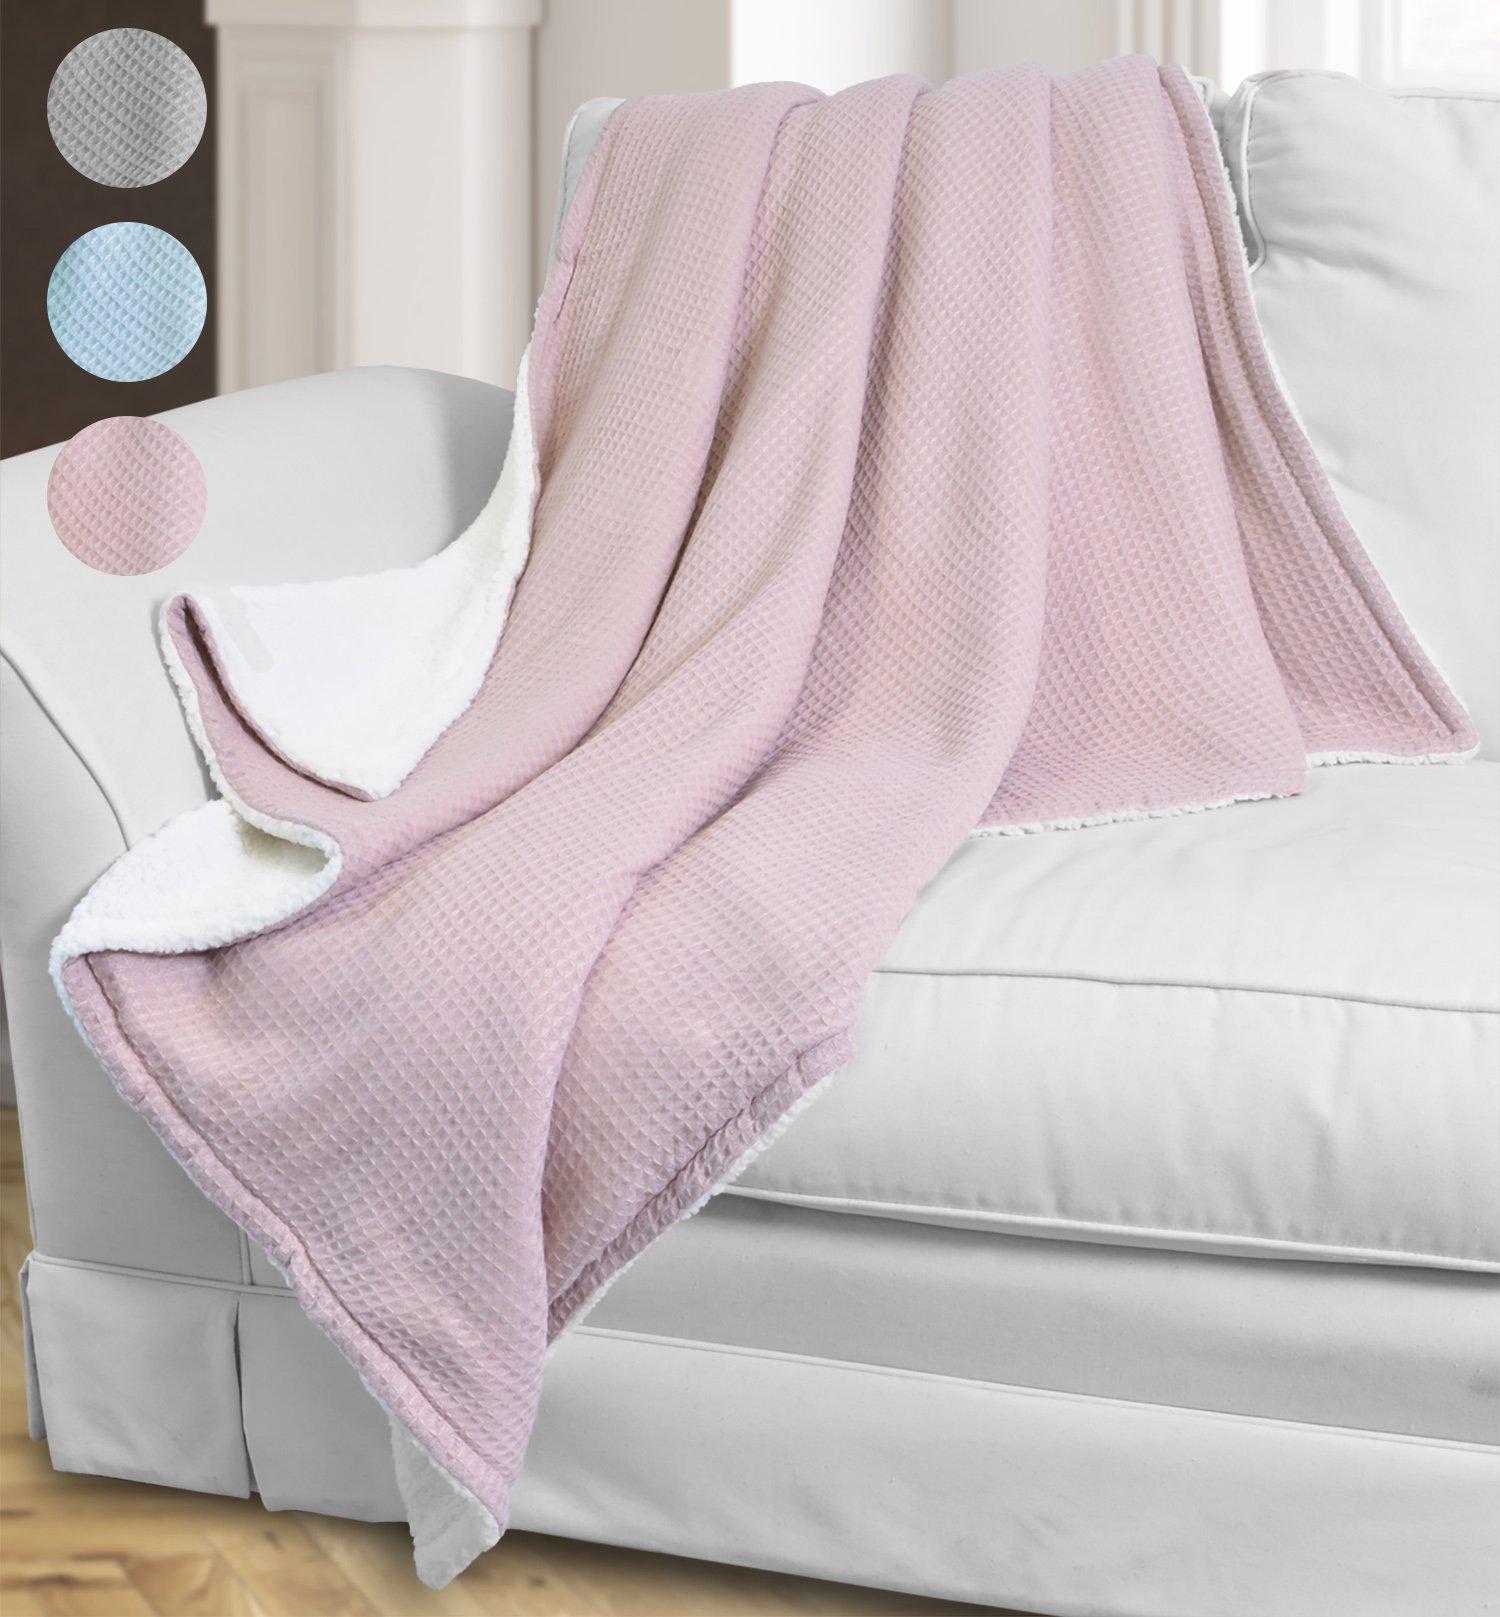 Catalonia Sherpa Throw Blanket,Reversible Cozy Knit Waffle Pattern ...